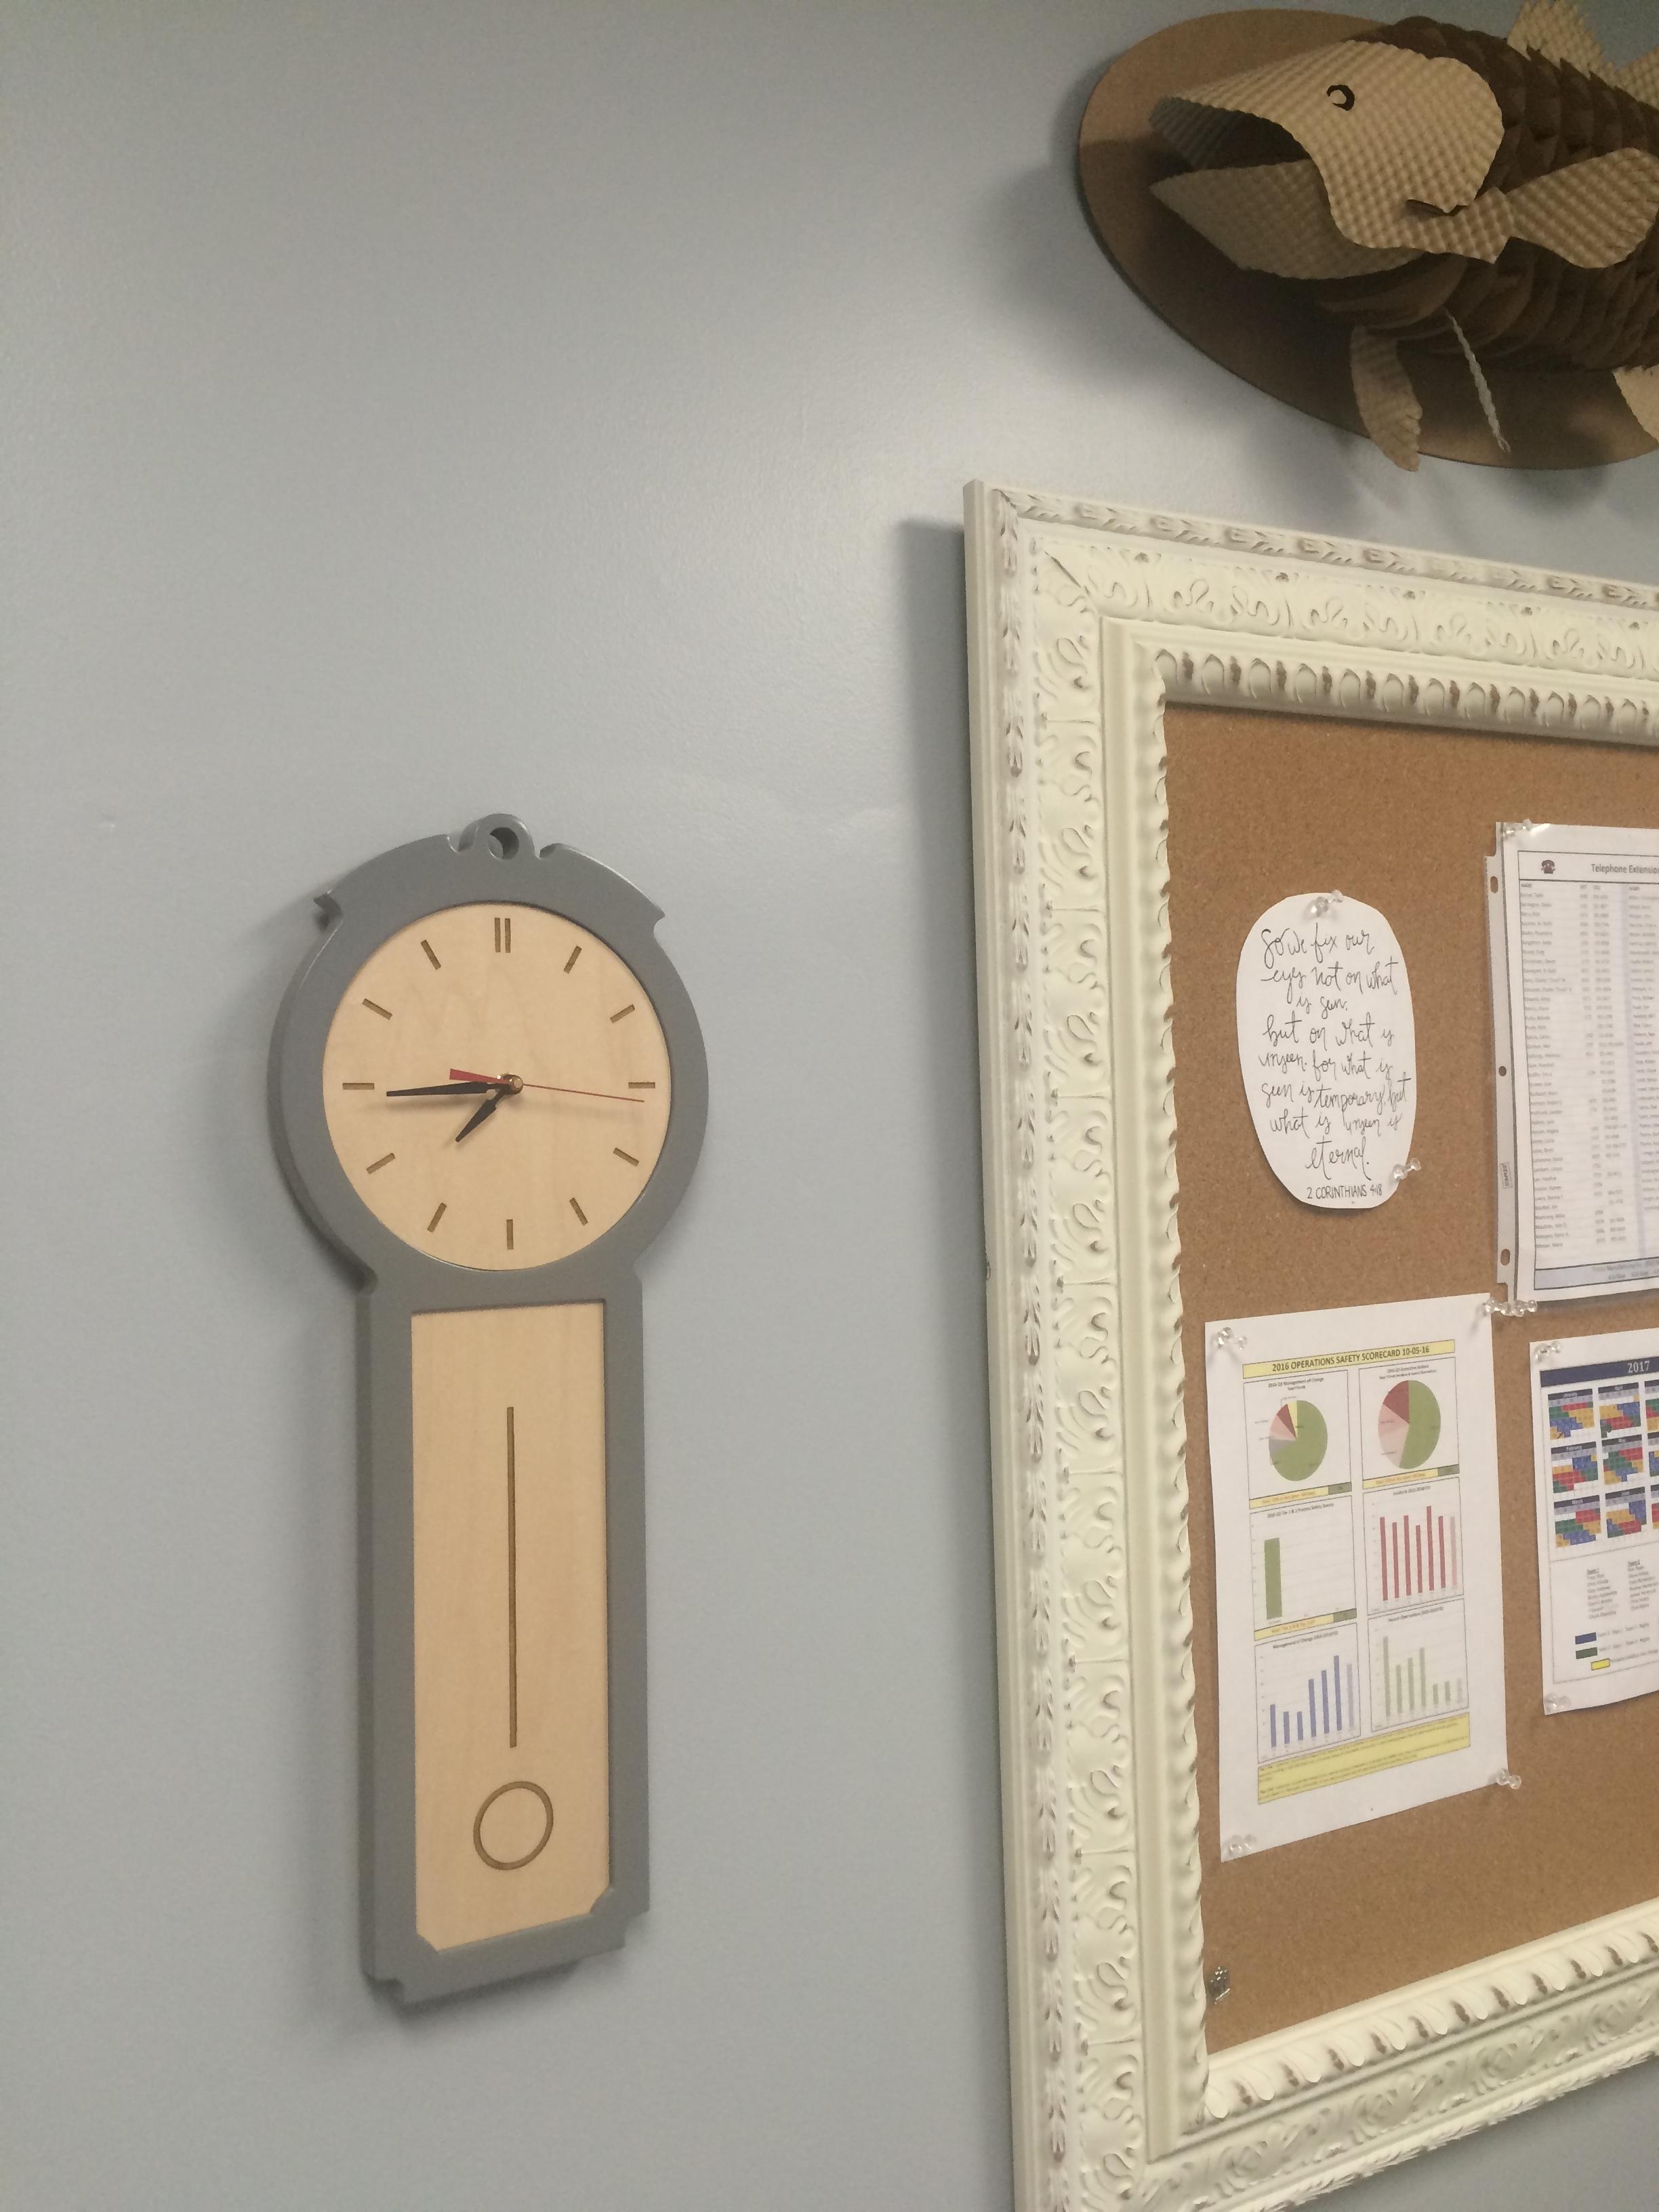 New office clock